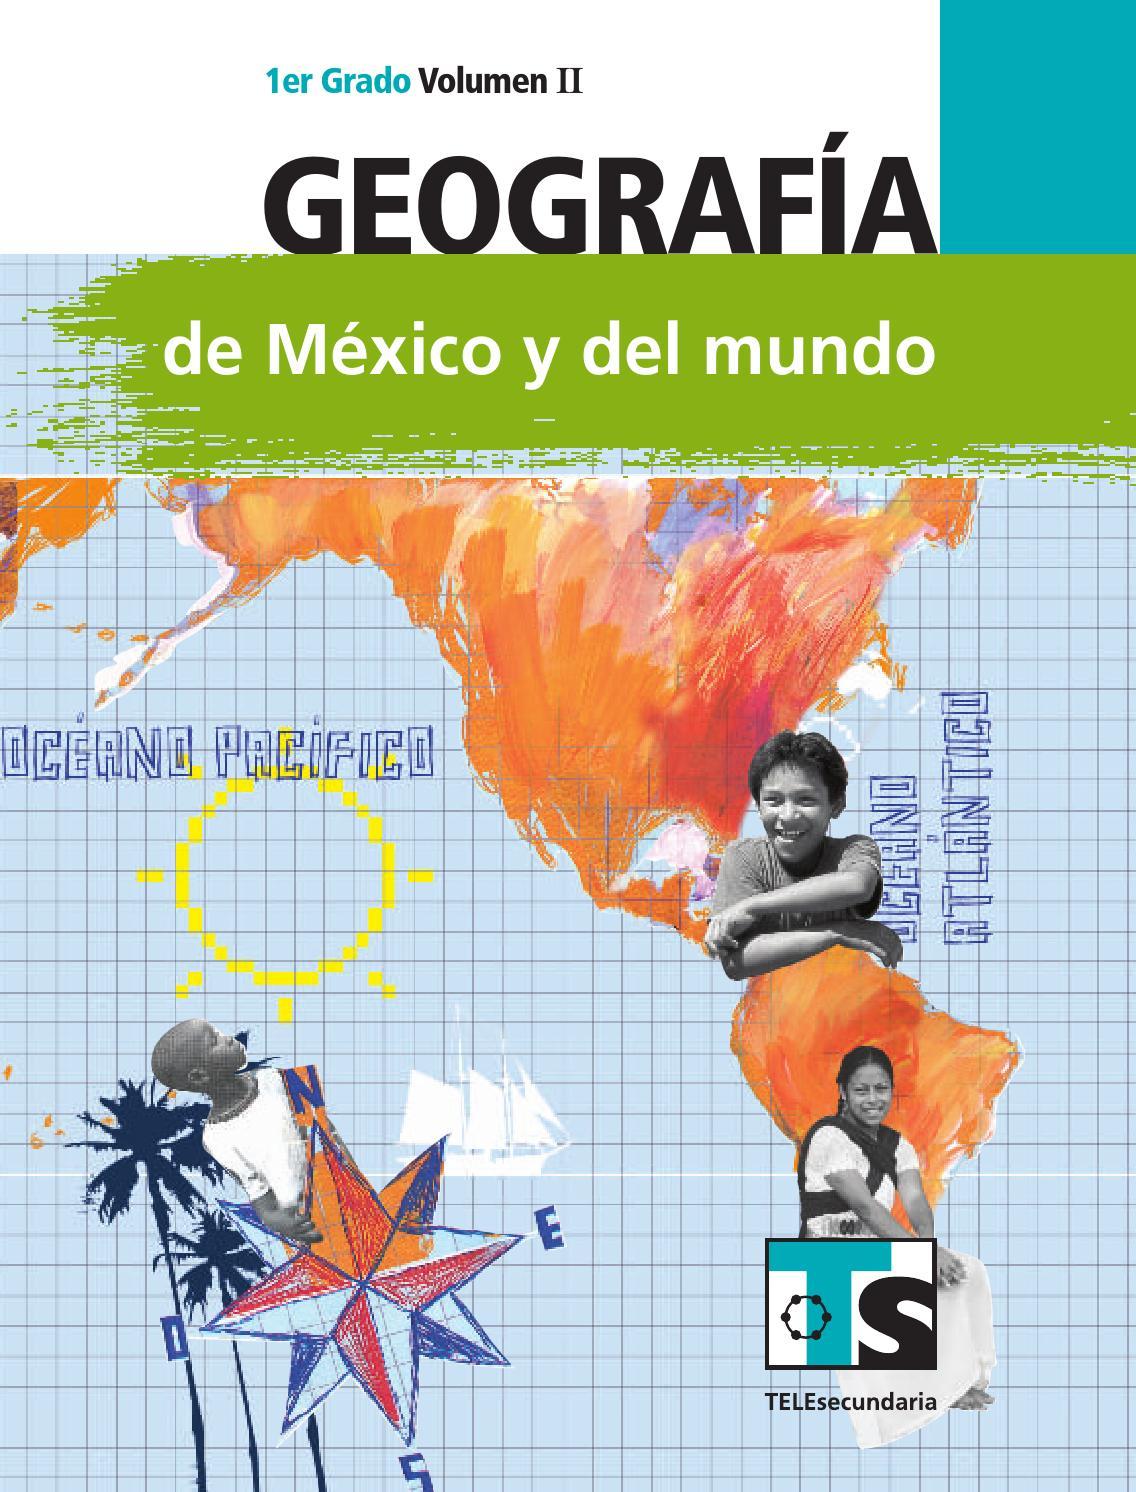 Geografía 1er. Grado Volumen II by Rarámuri - issuu